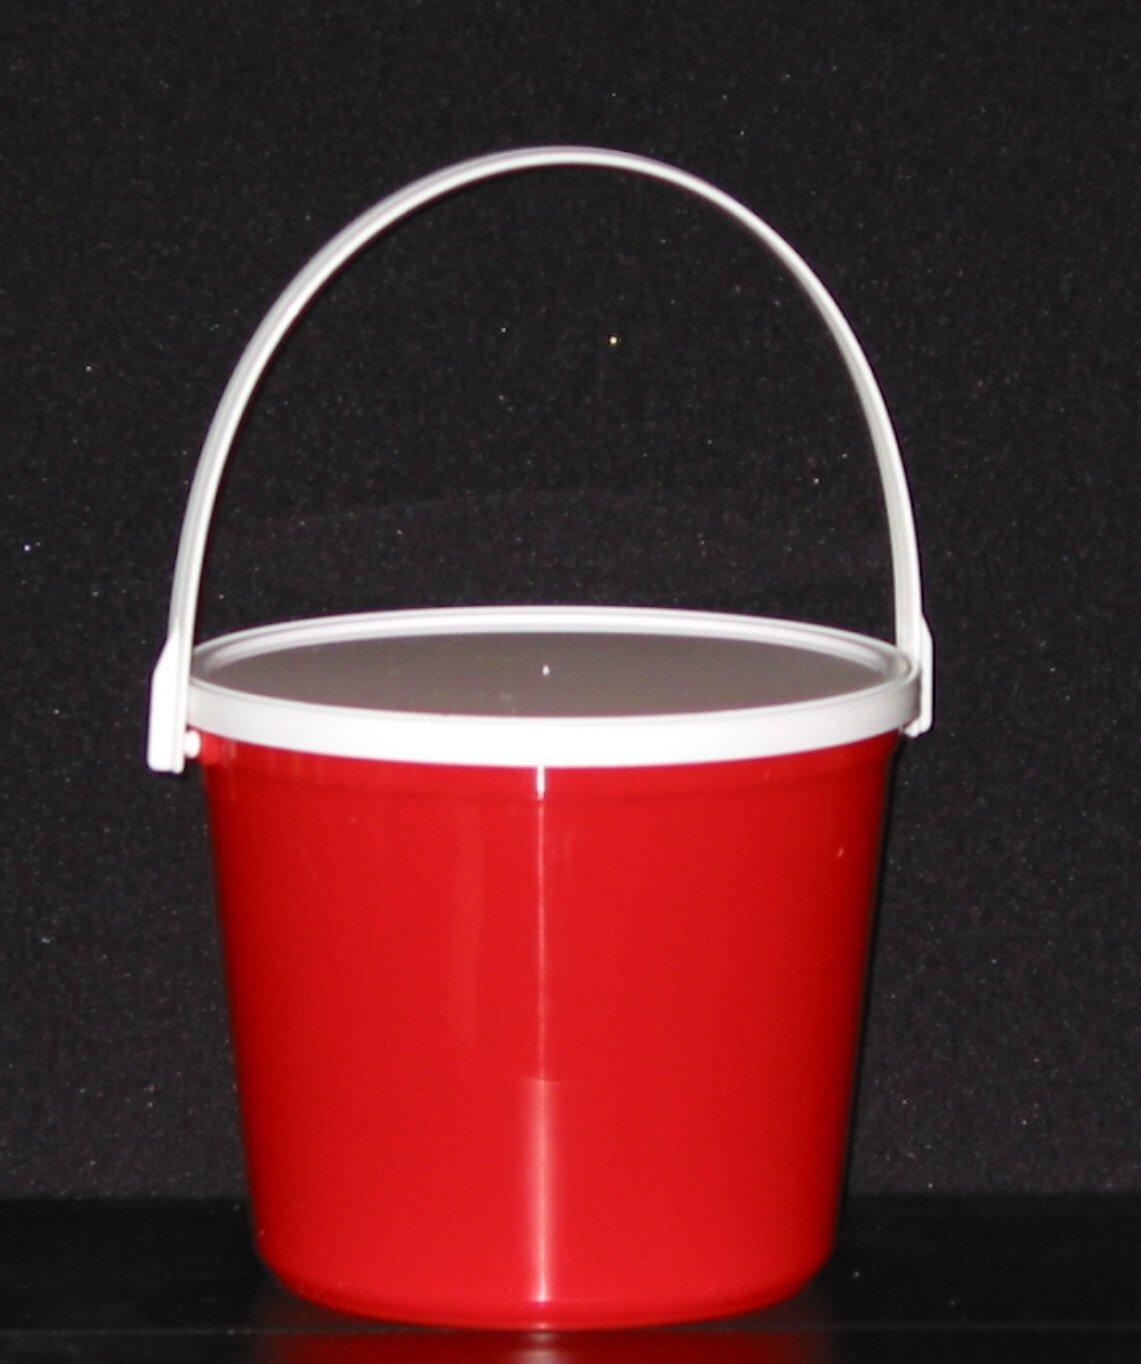 Plastic Buckets & Lids, 80 Ounces, 6 Pack,1 each Red Blue Yellow Orange Purple & Green by Talisman (Image #5)